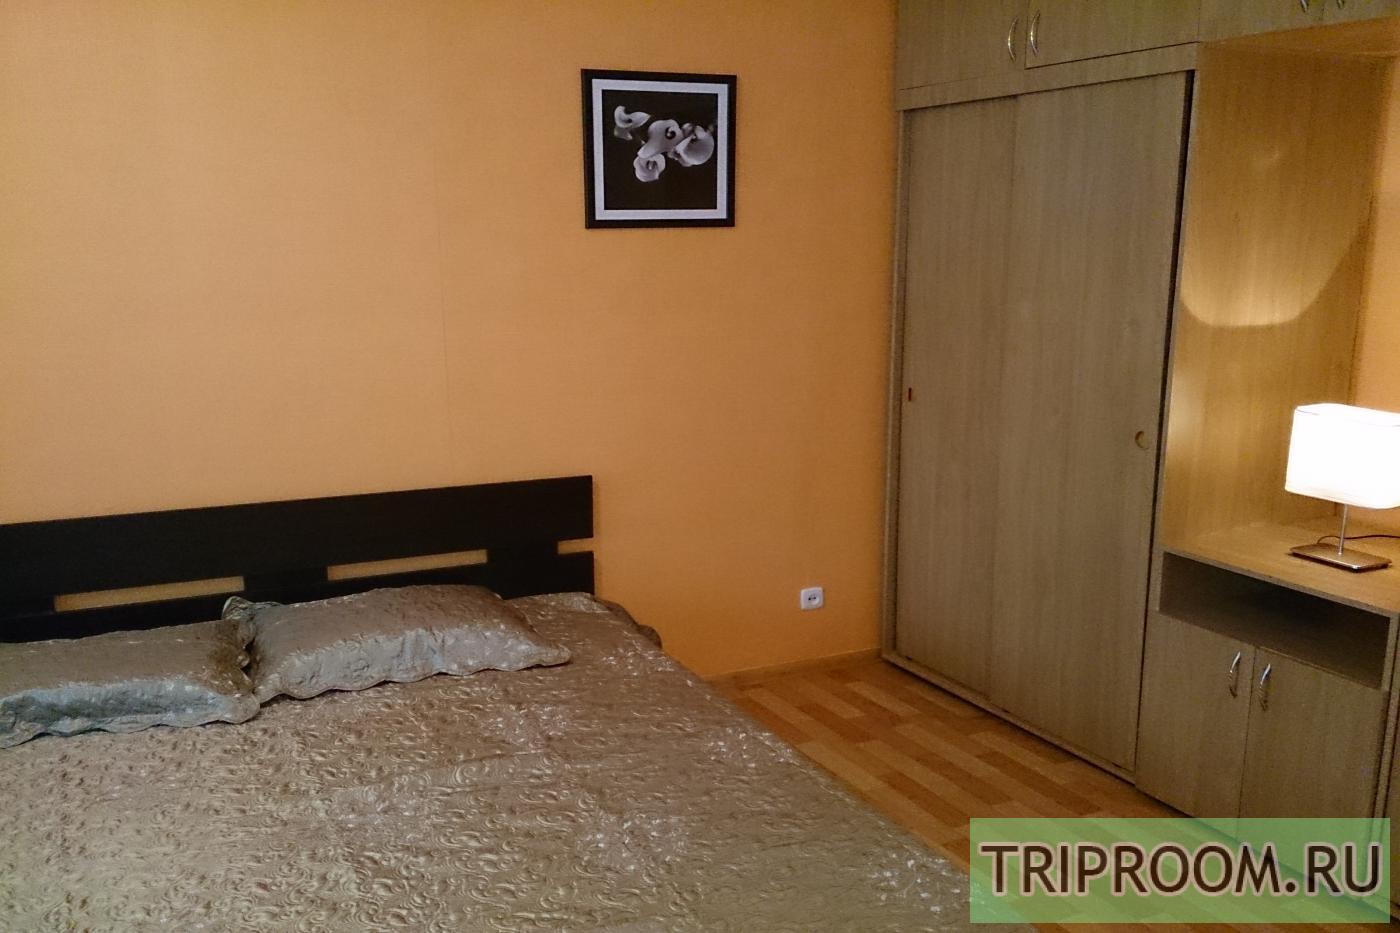 1-комнатная квартира посуточно (вариант № 12826), ул. Челюскинцев улица, фото № 2